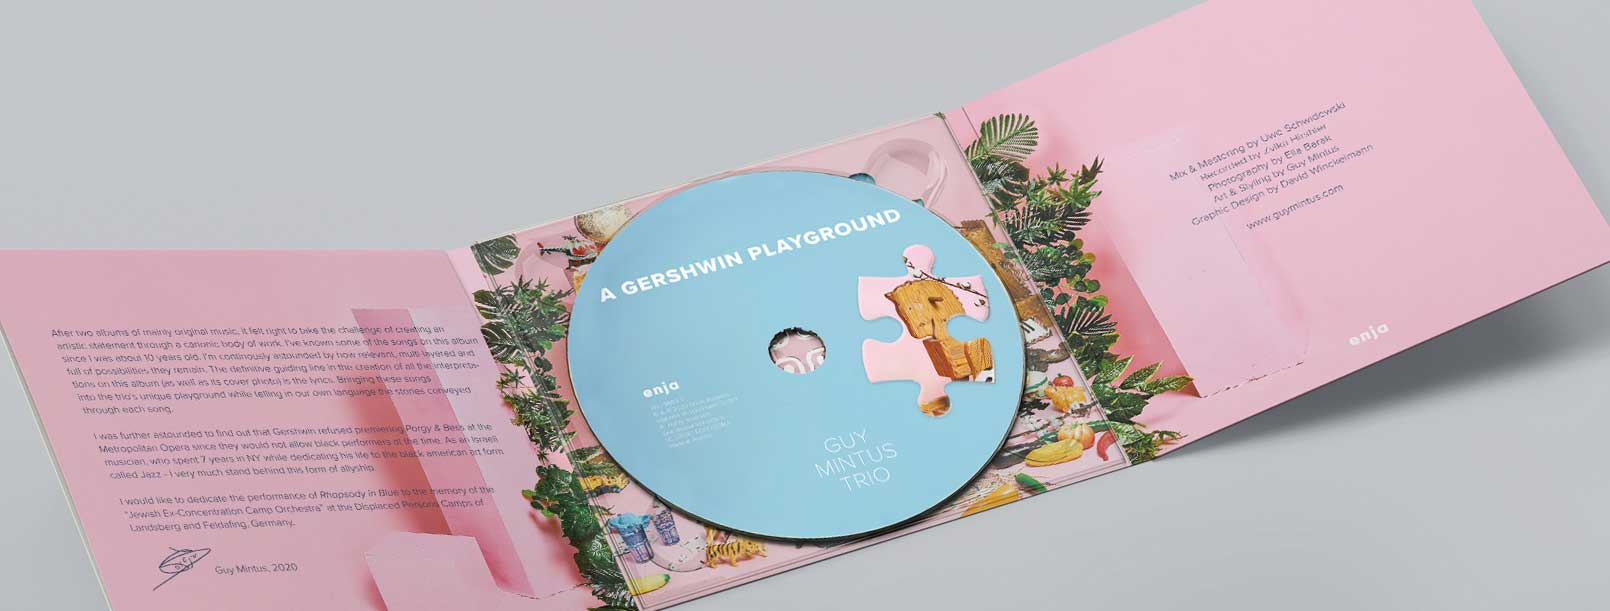 Guy Mintus – Gershwin Playground